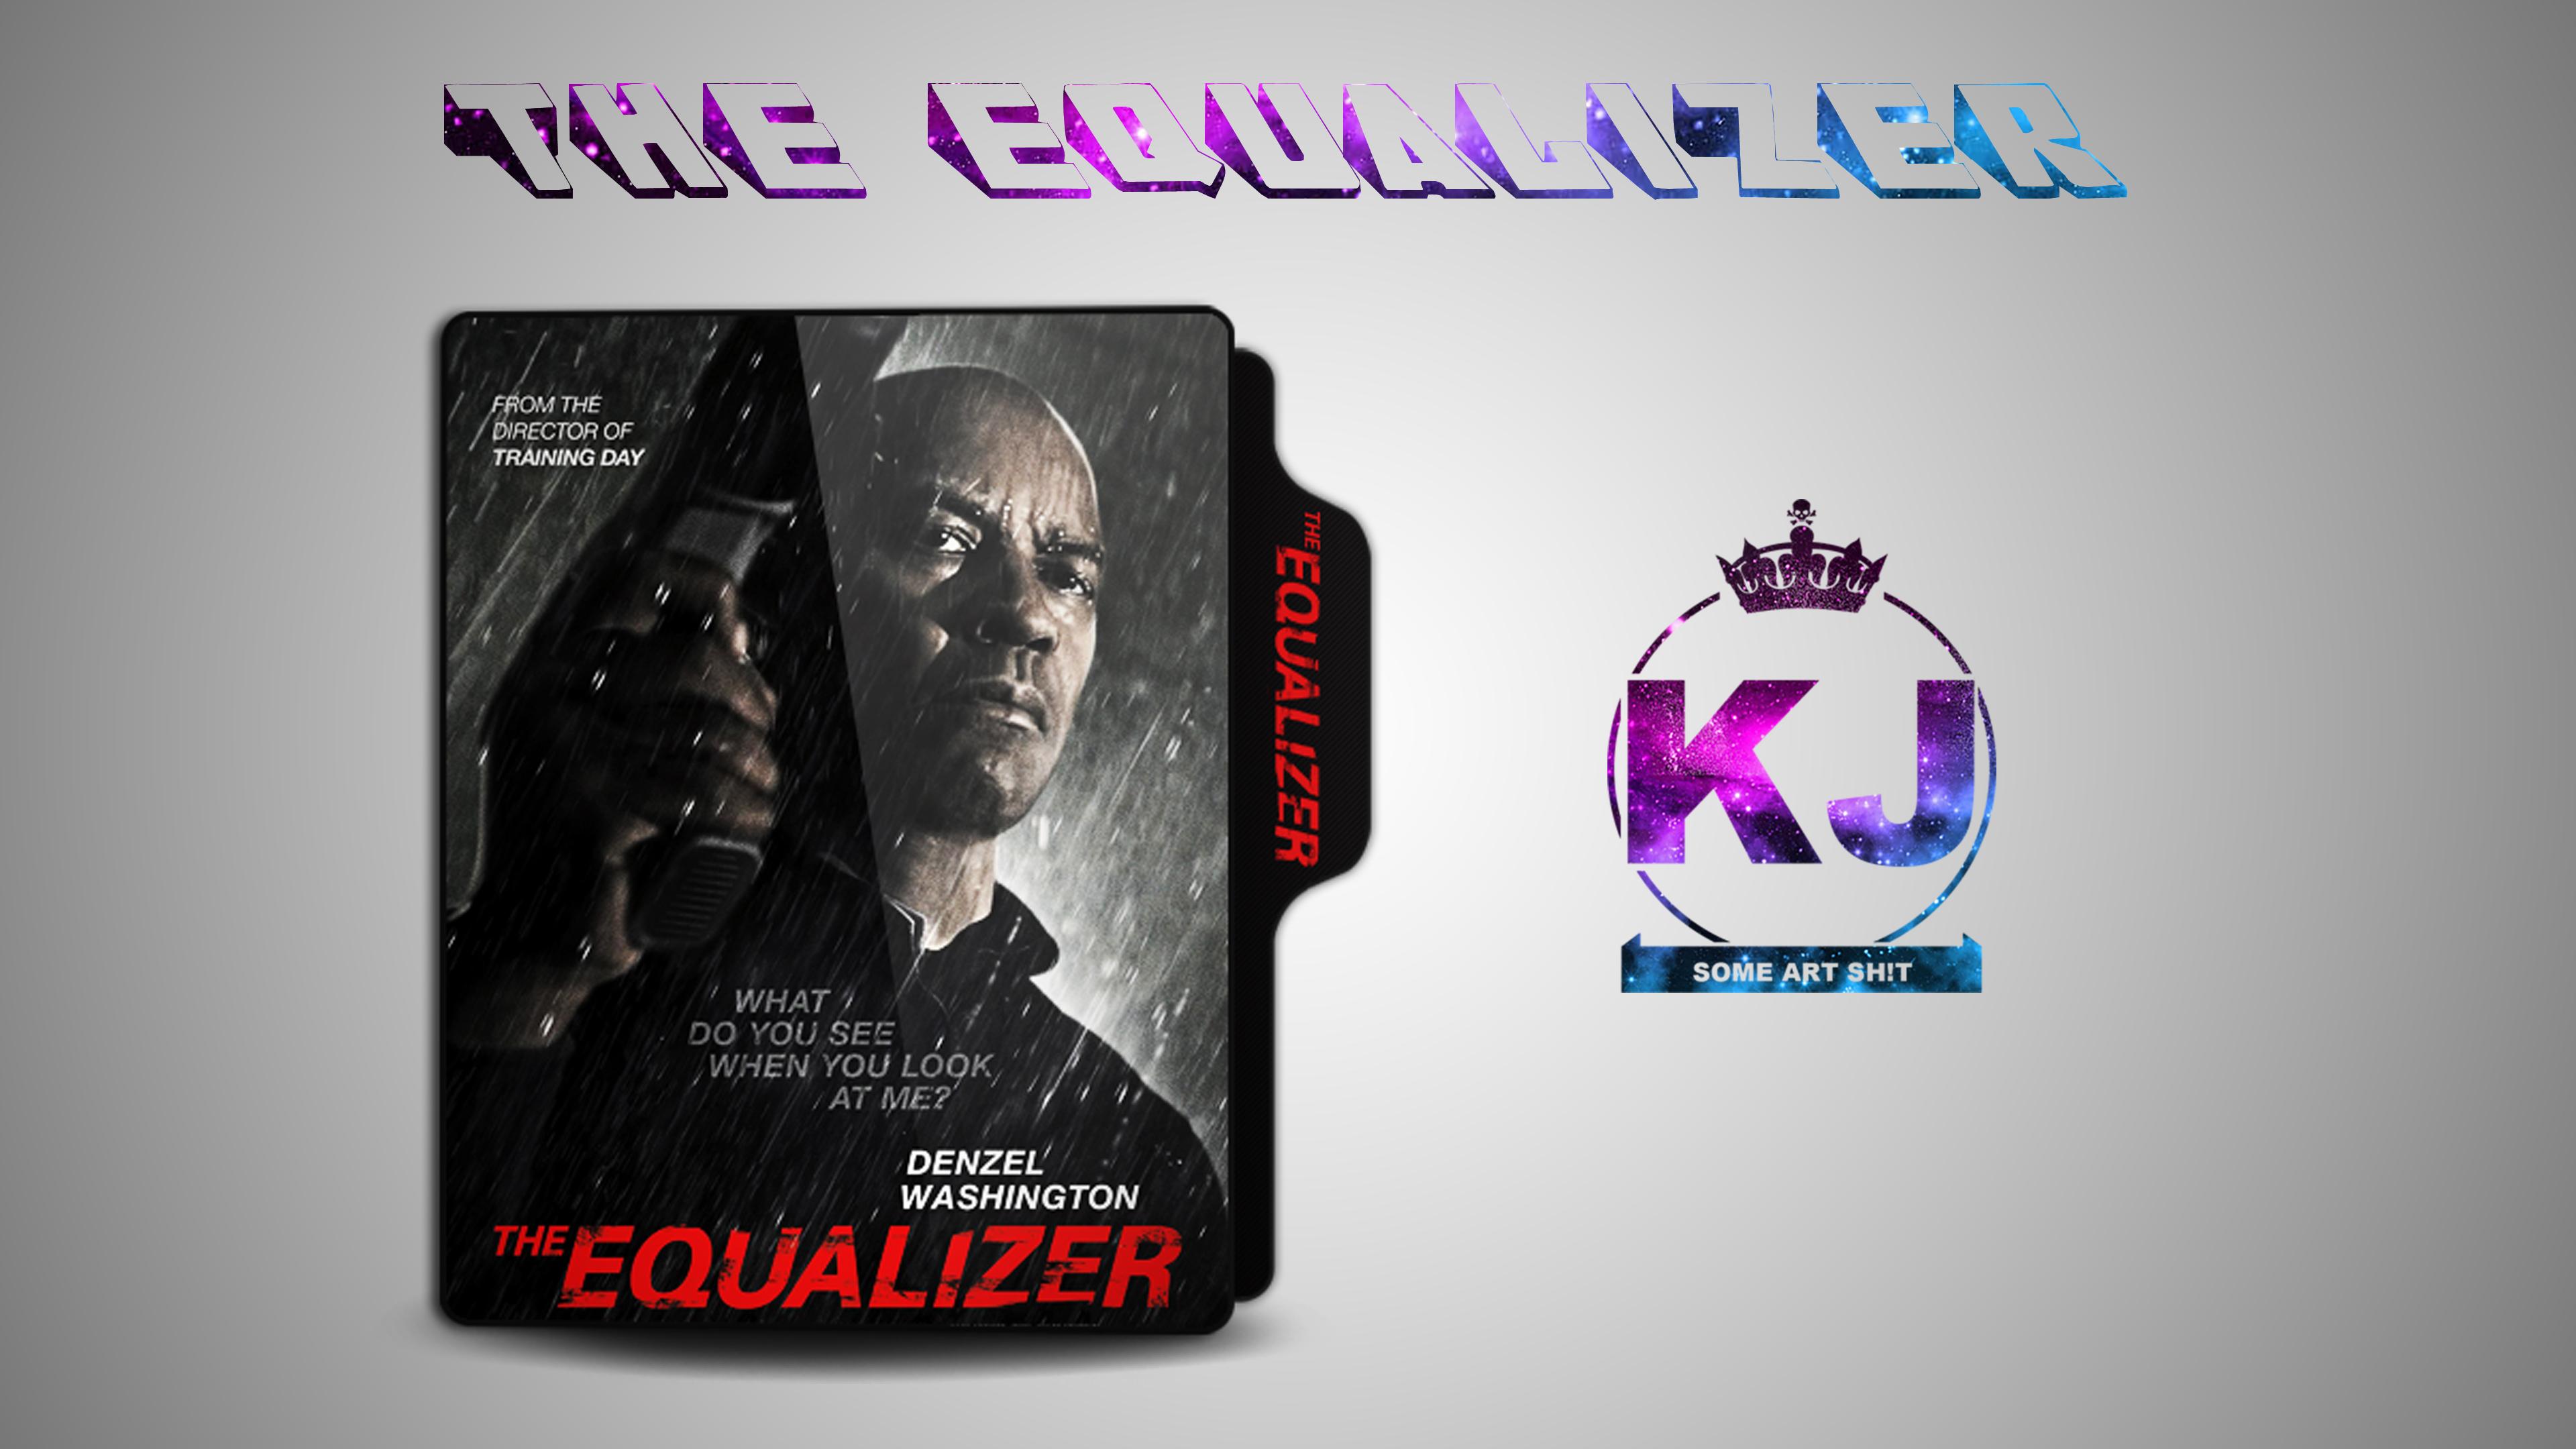 The Equalizer 2014 Folder Icon By Kingjoe93 On Deviantart